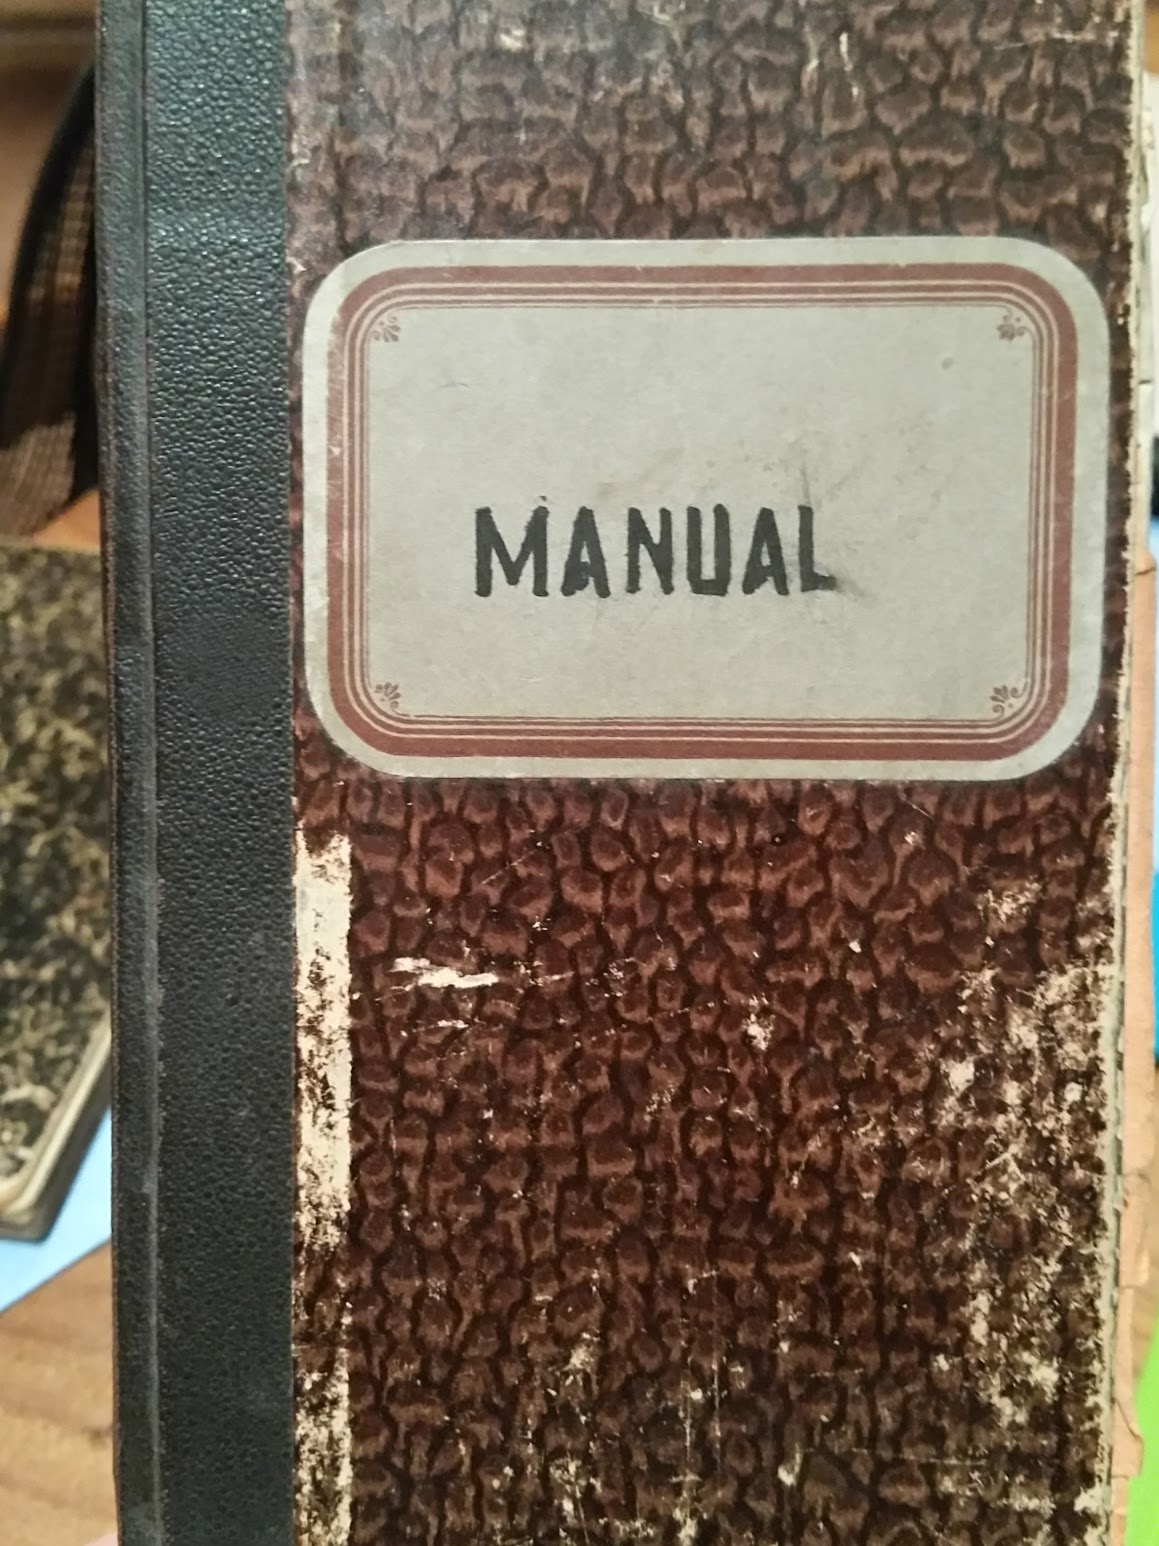 Apotheker-Manual - Rezeptbuch